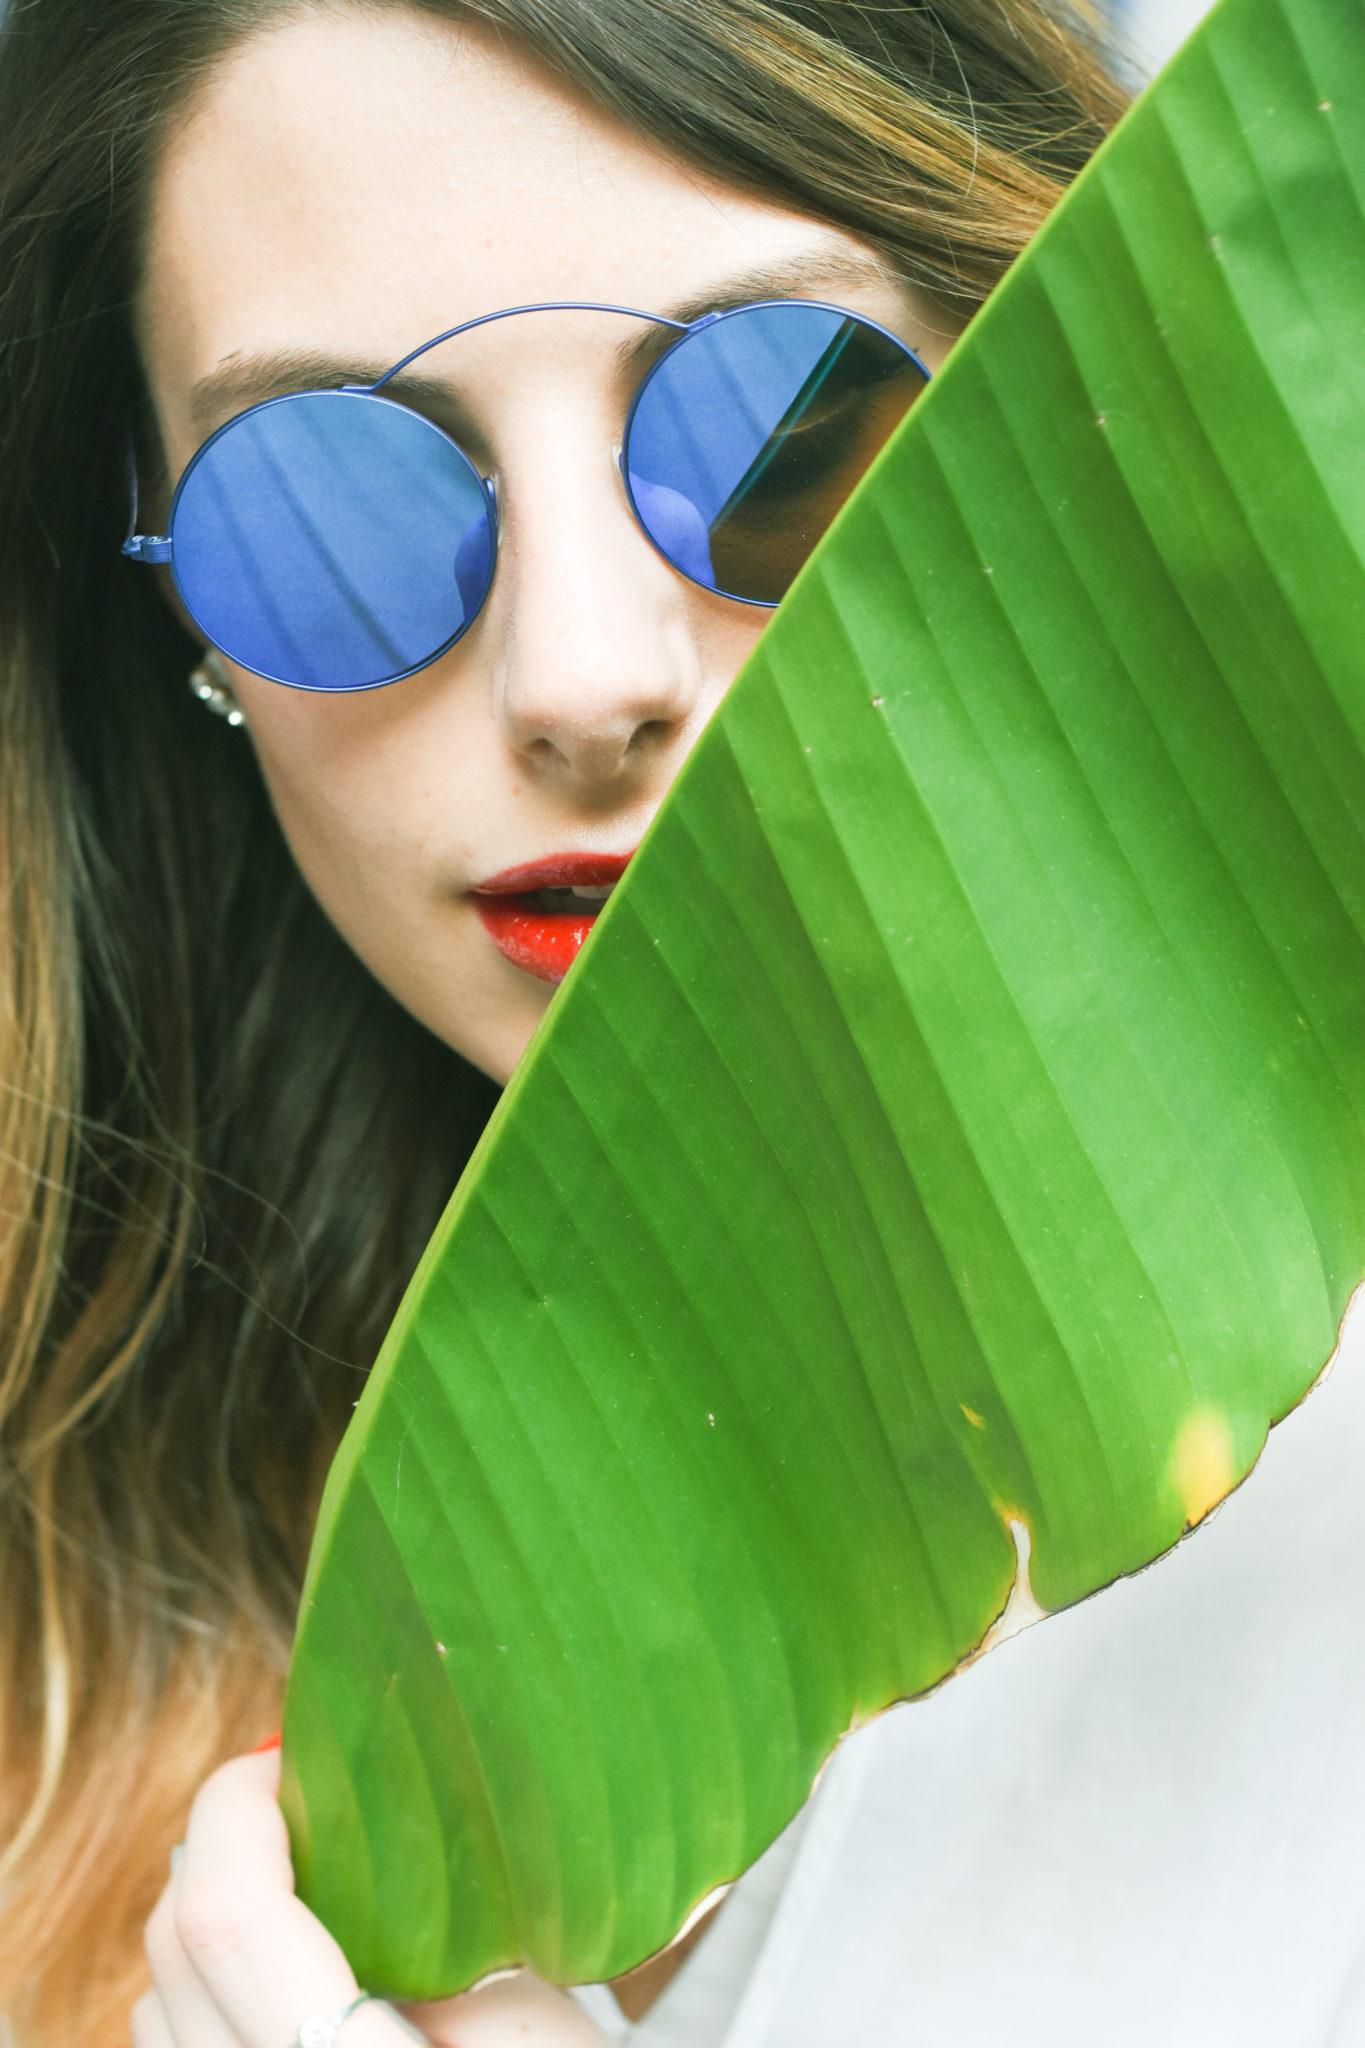 giulia de martin spektre sunglasses eyewear behindmyglasses.com mirror lenses metro 2 flat met-ro sunnies -8